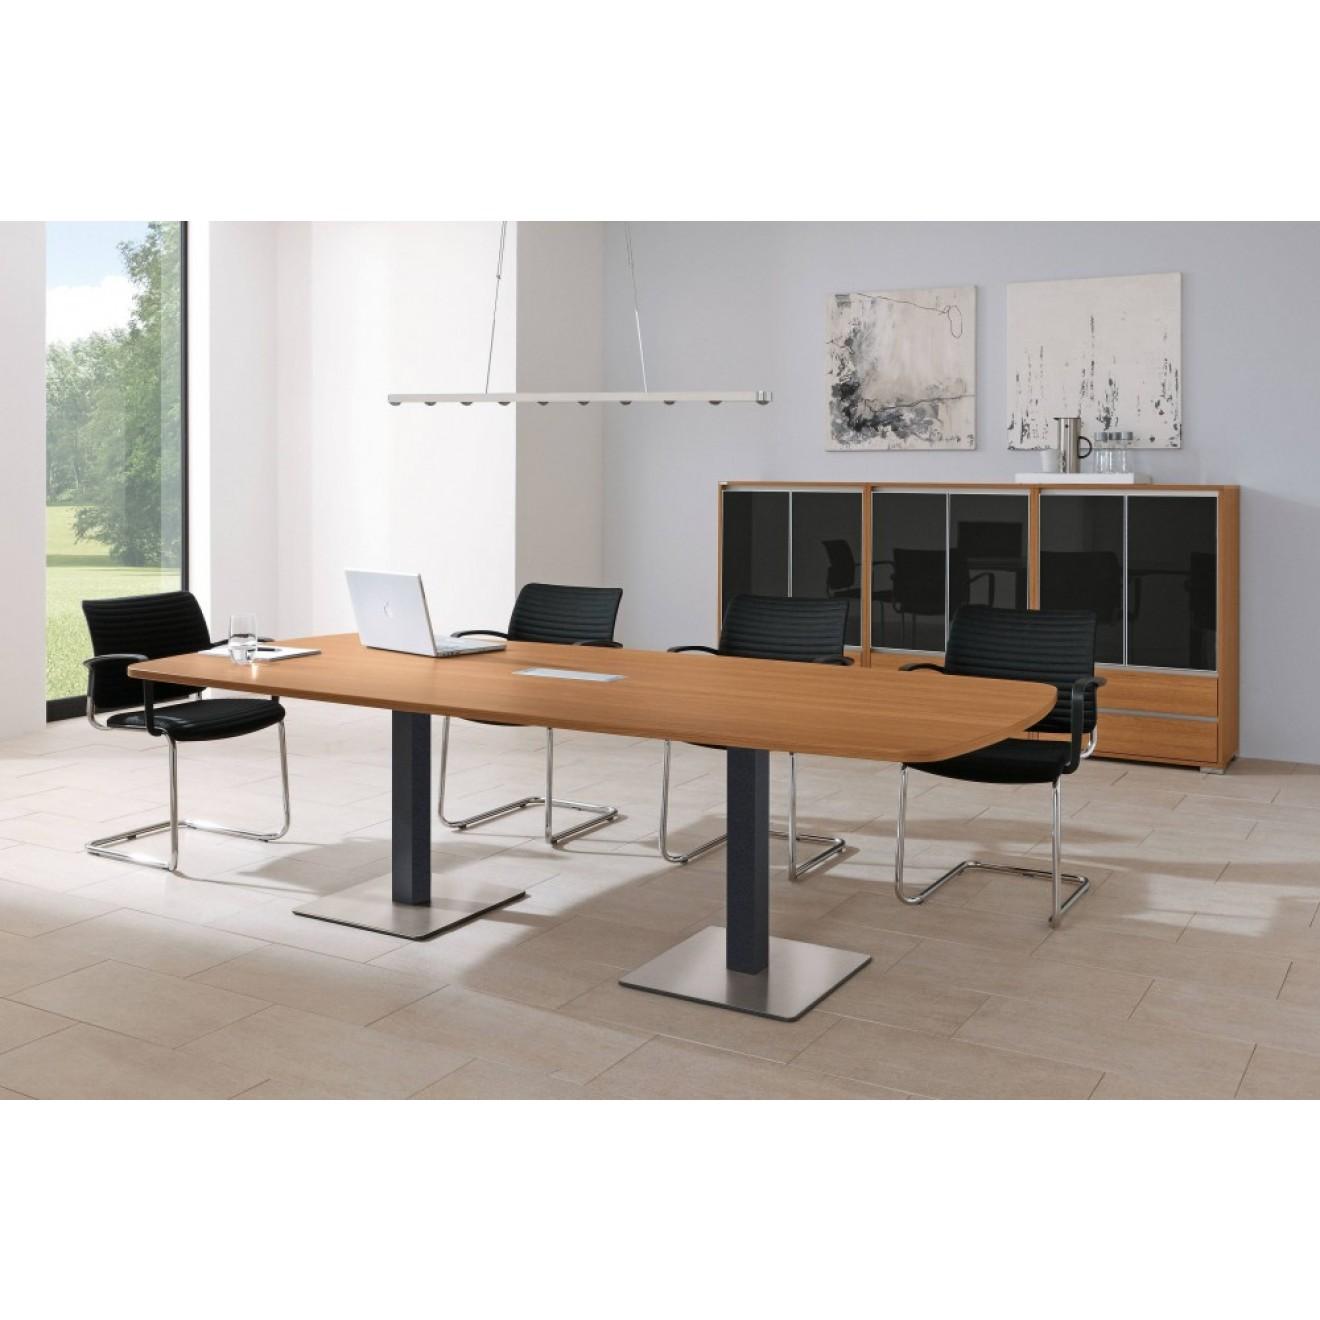 palmberg crew besprechungstisch 160 220 cm. Black Bedroom Furniture Sets. Home Design Ideas